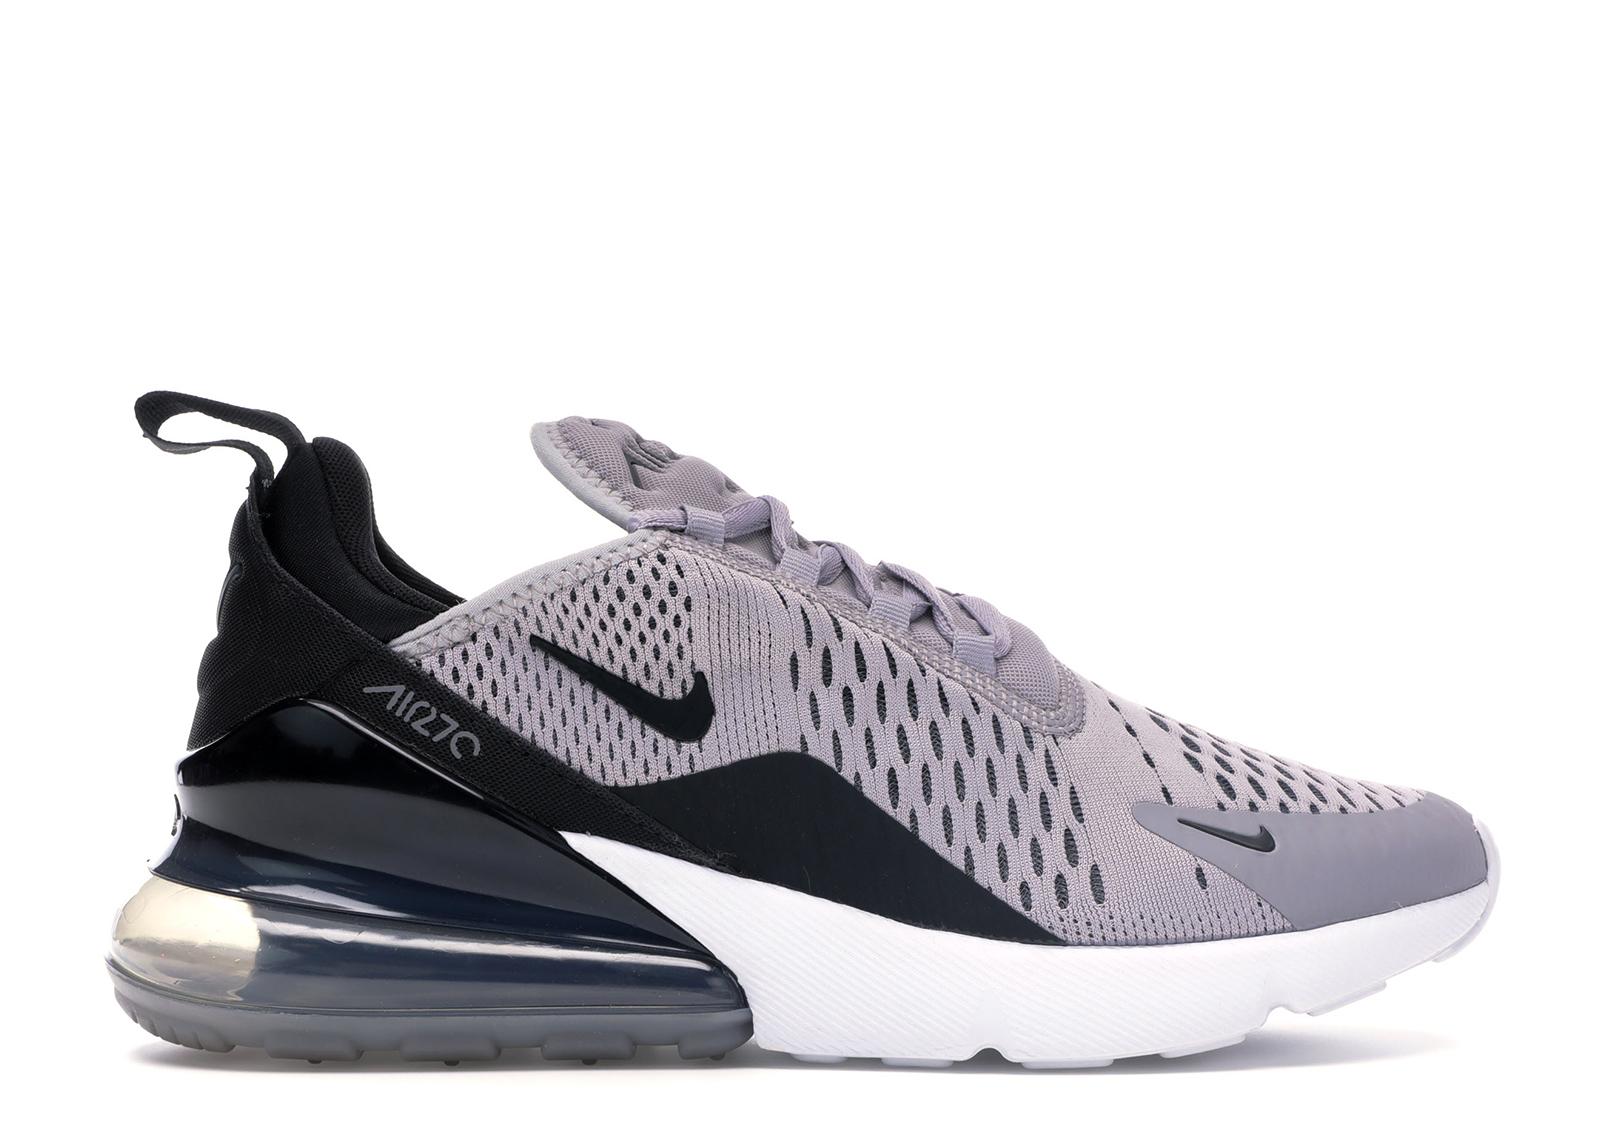 heet Nike|Adidas schoenen grote korting Nike|Adidas schoenen